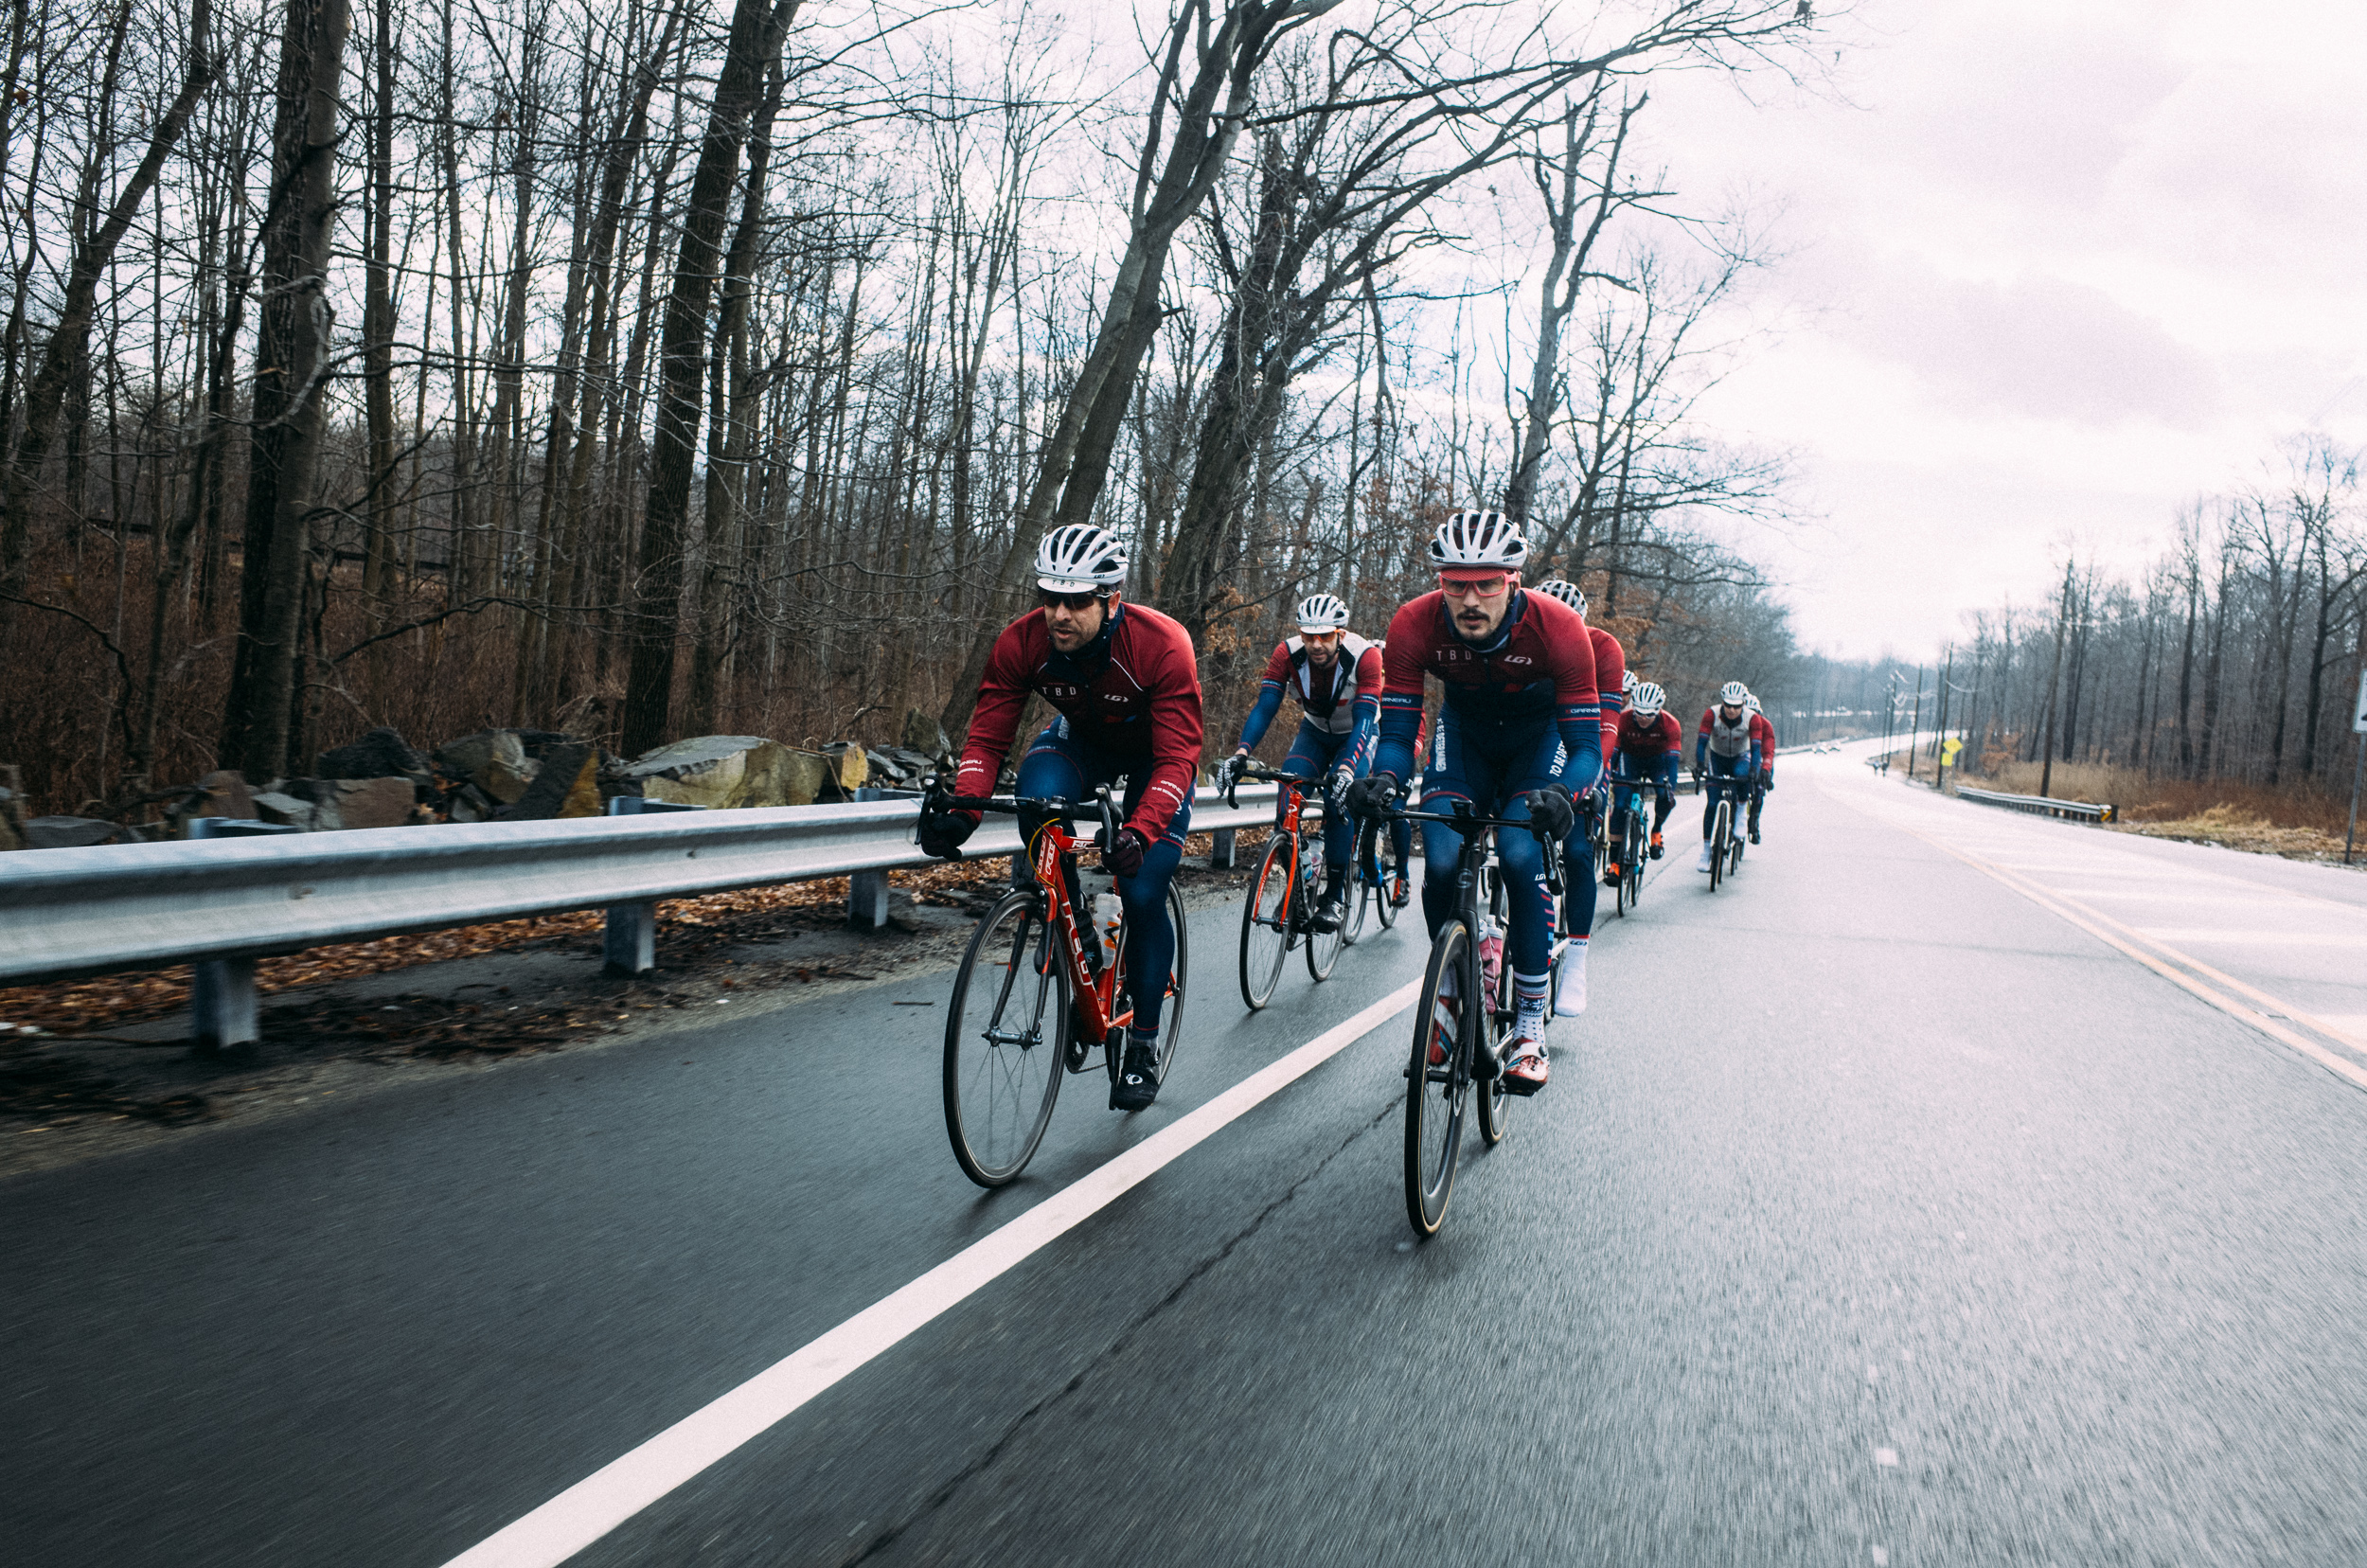 to-be-determined-photo-rhetoric-team-ride-january-1011.jpg